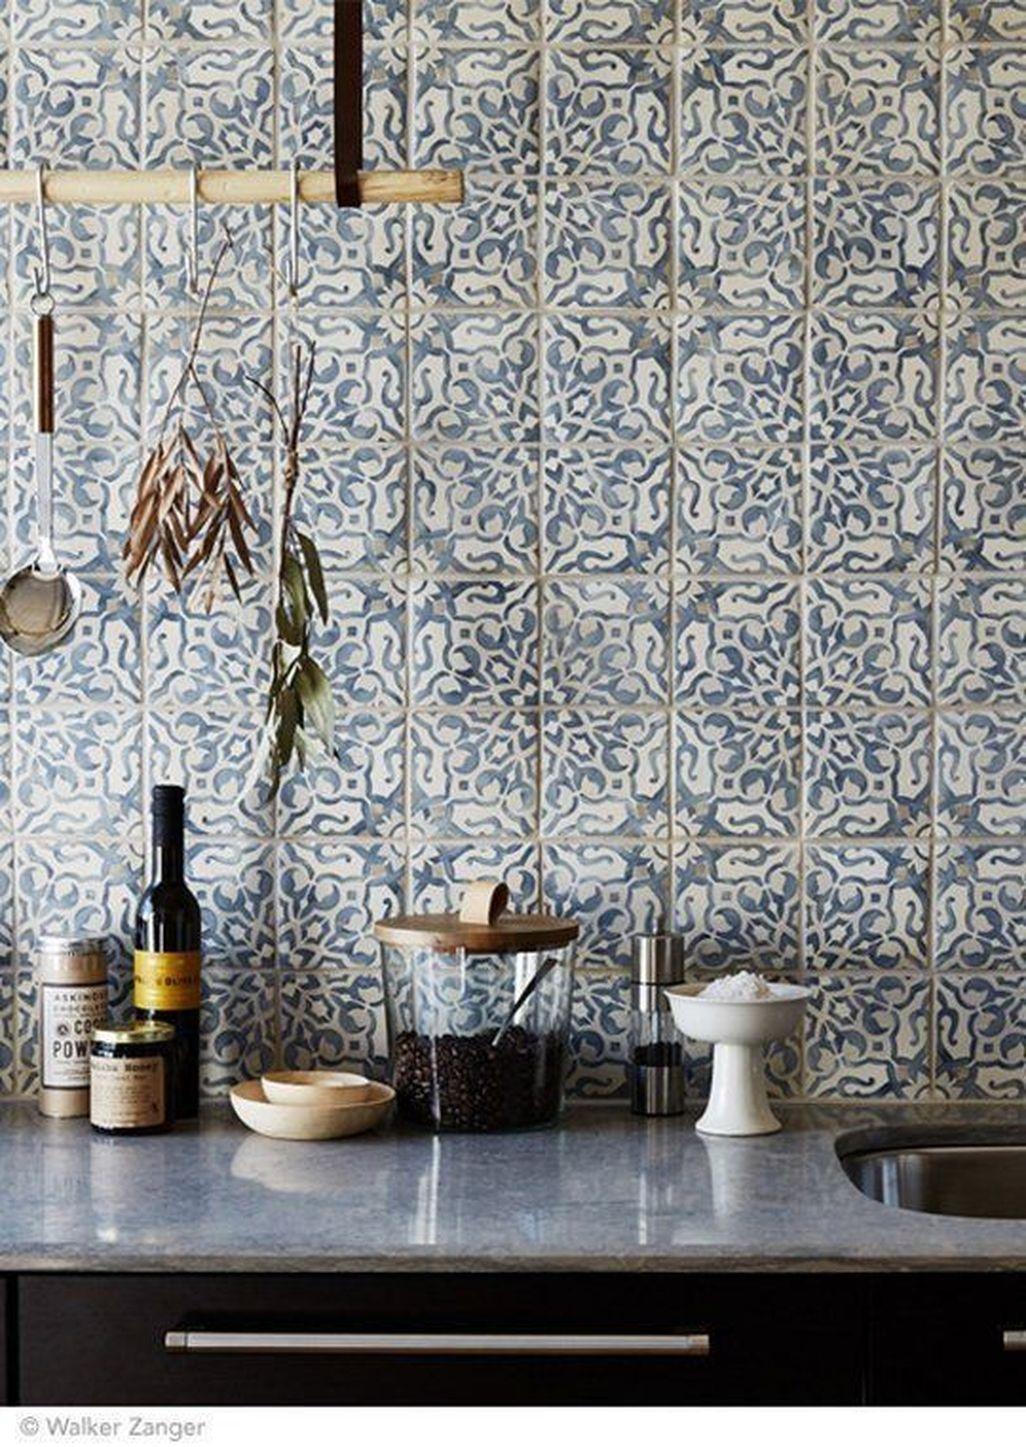 Awesome White Kitchen Backsplash Design Ideas 38